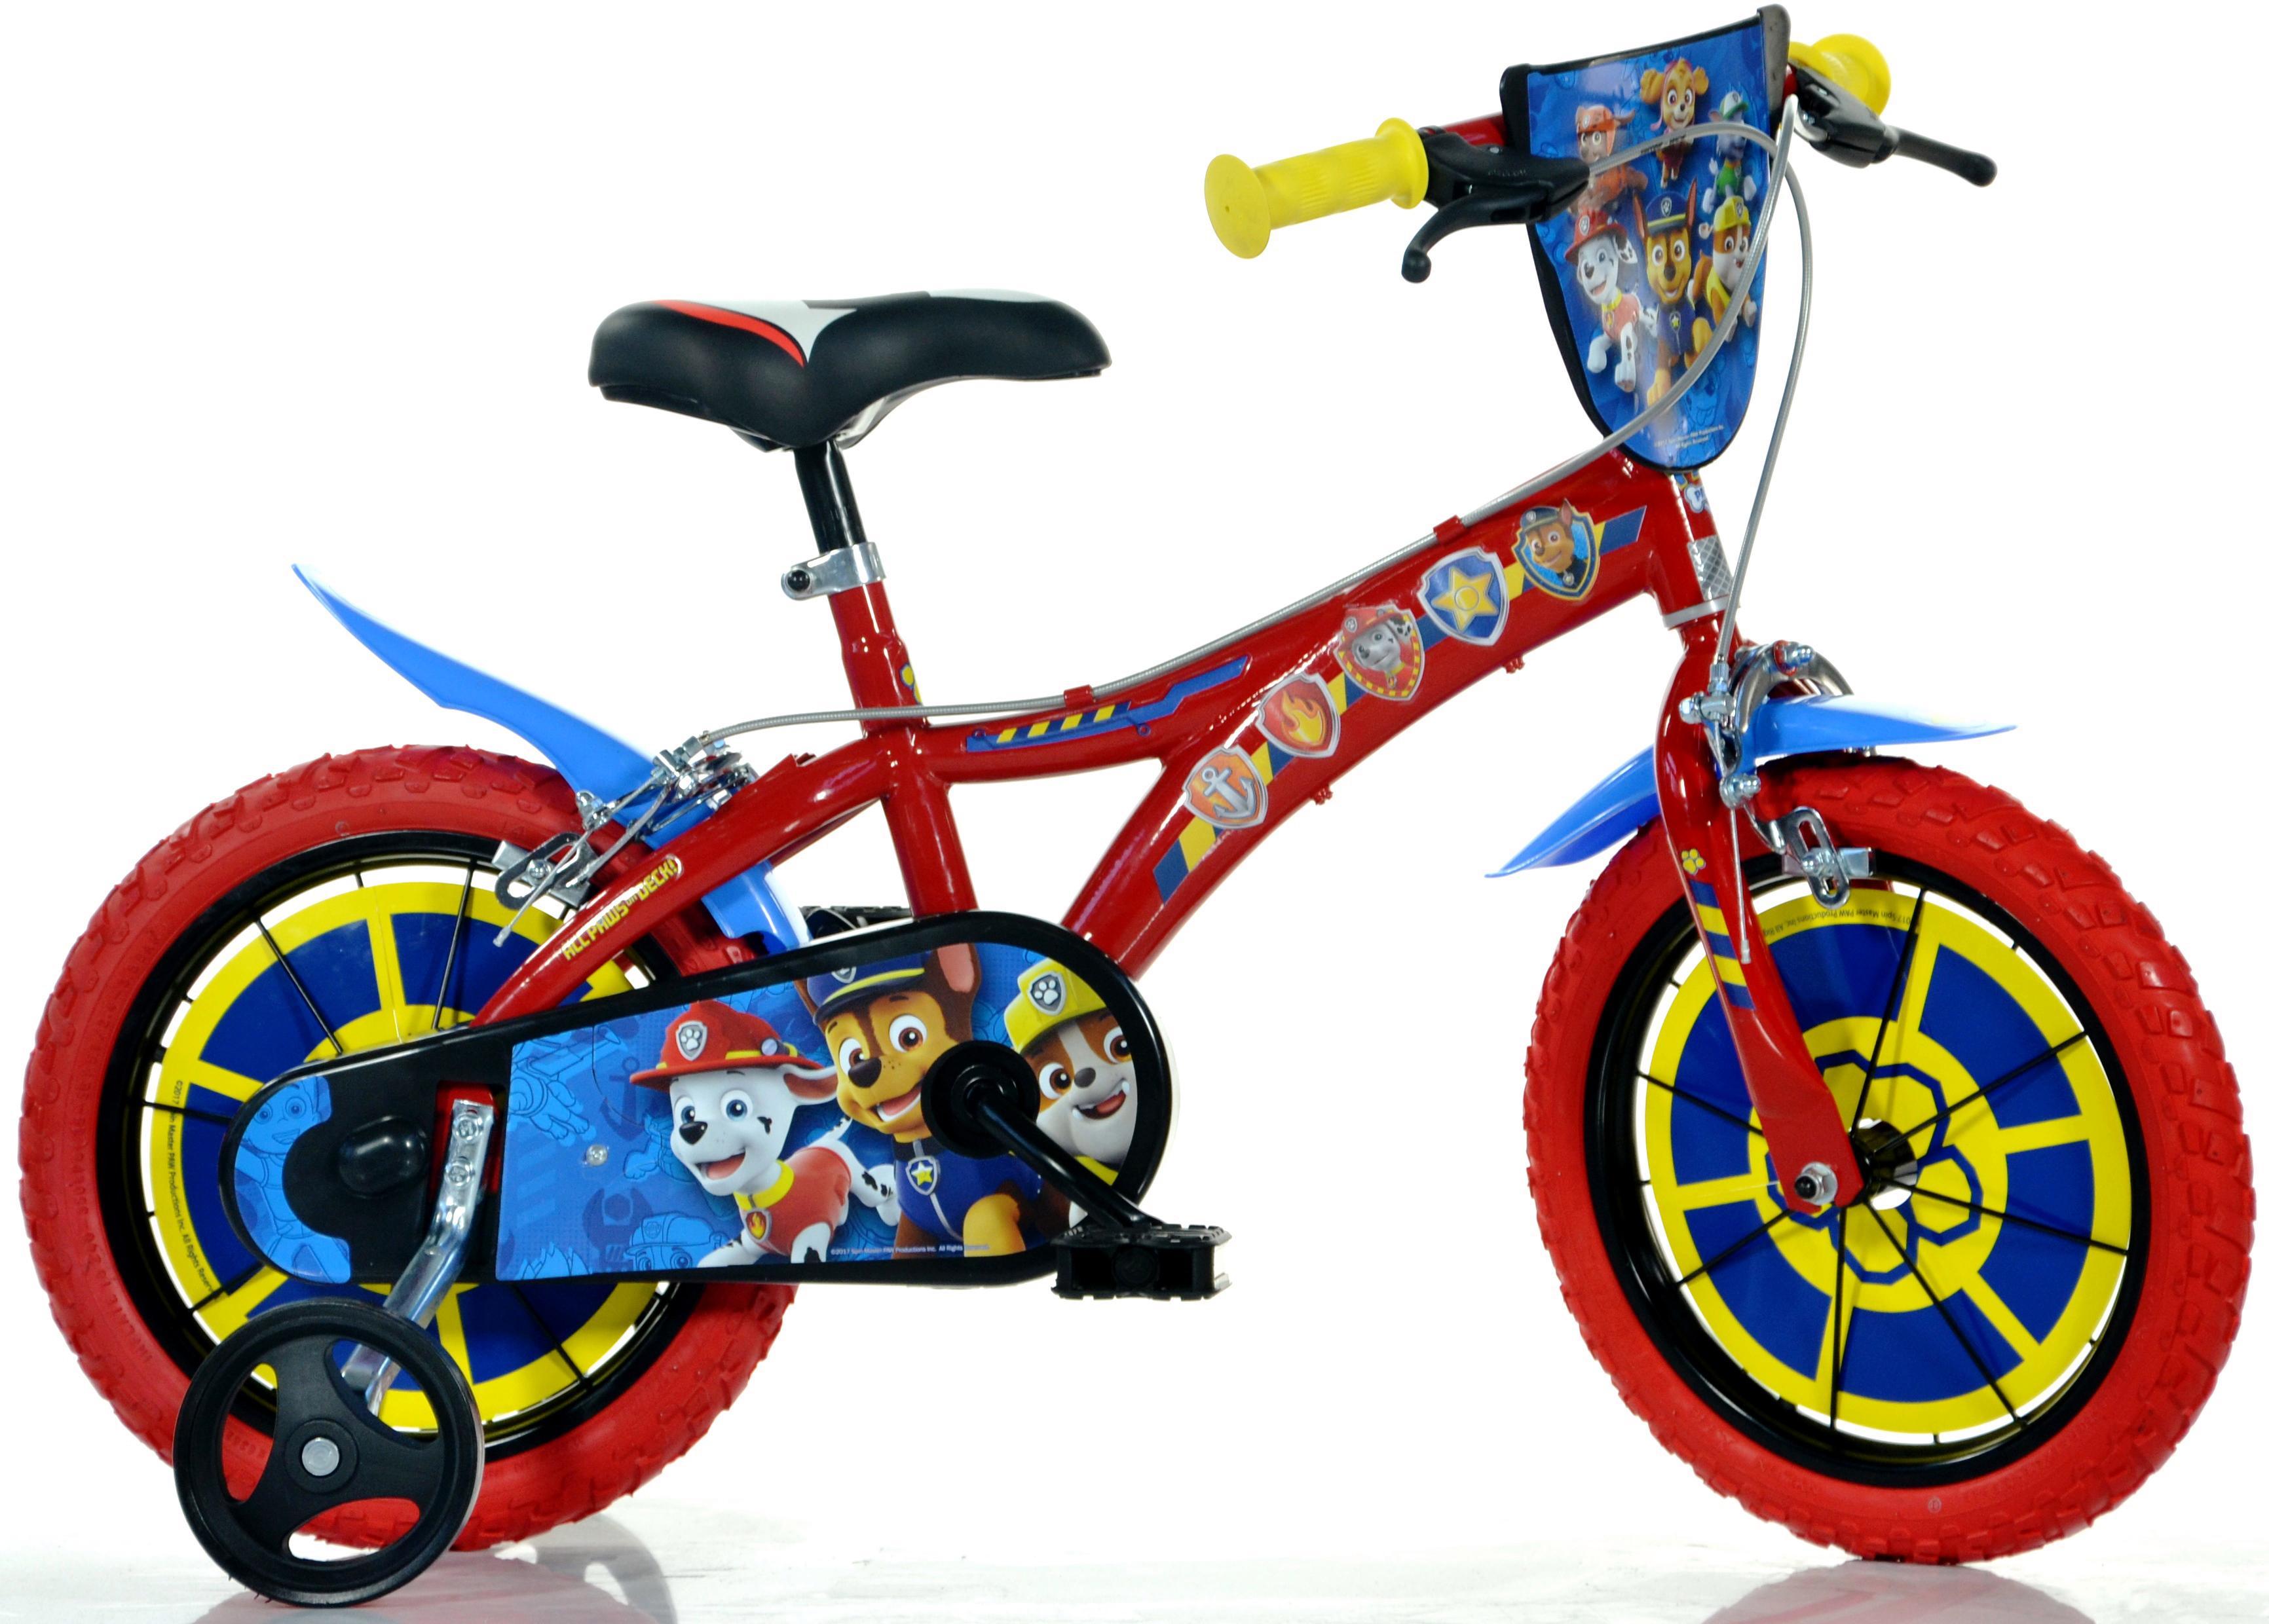 Dino Kinderfahrrad Paw Patrol rot Kinder Kinderfahrräder Fahrräder Zubehör